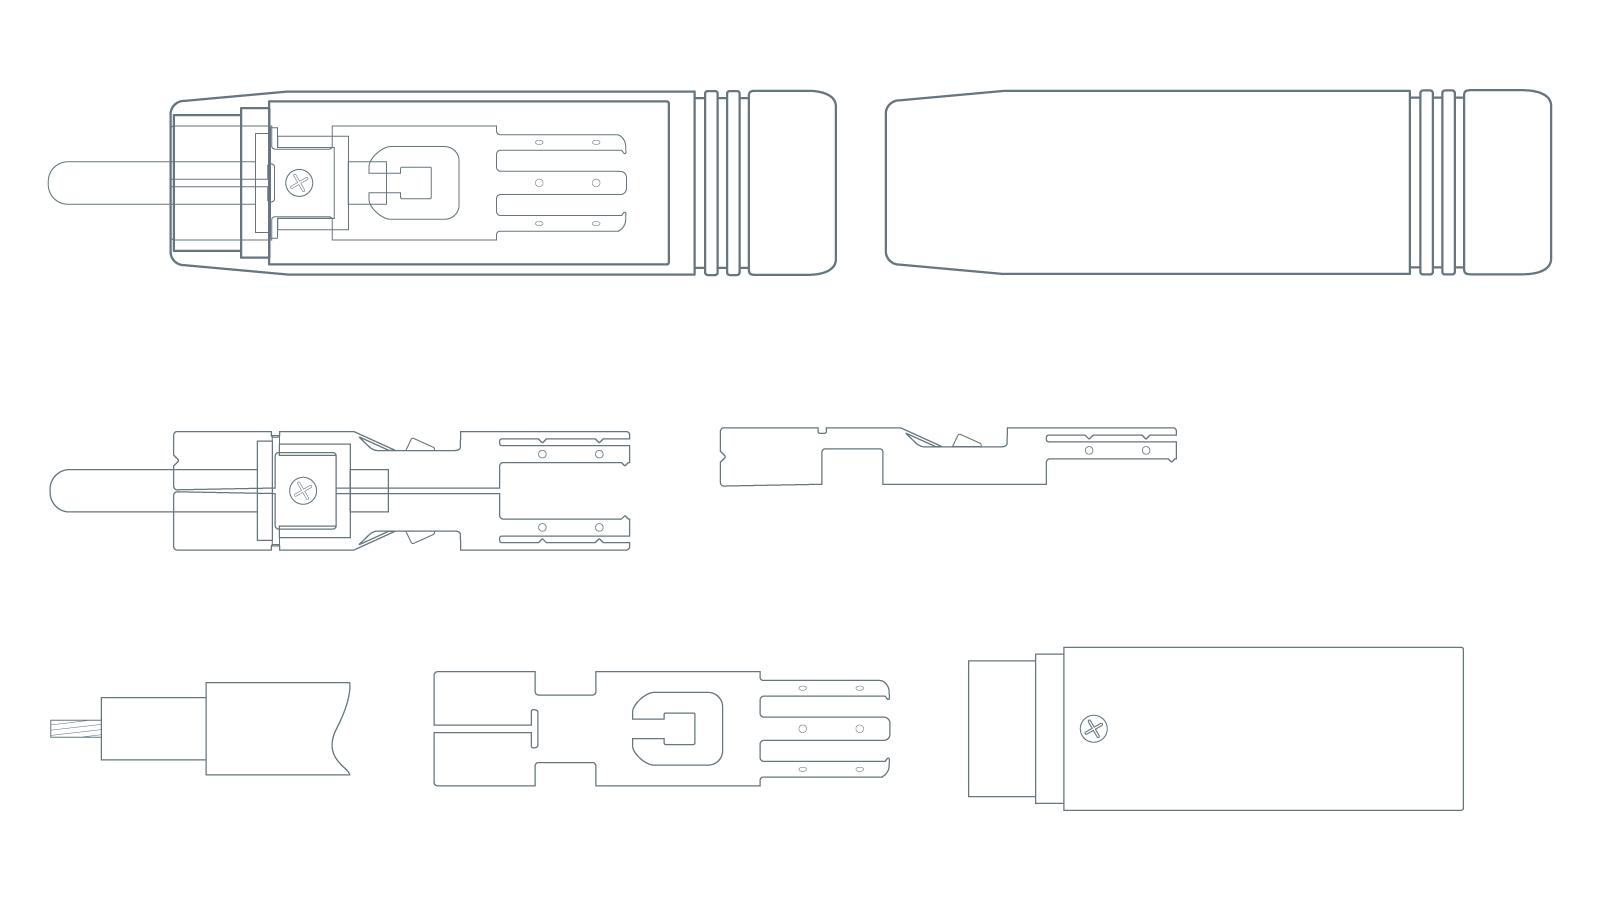 Atlas Mavros Bnc Sp Dif Digital Audio Cable Future Shop Jack Plate Wiring Diagram Ultra Rca Plug Technical